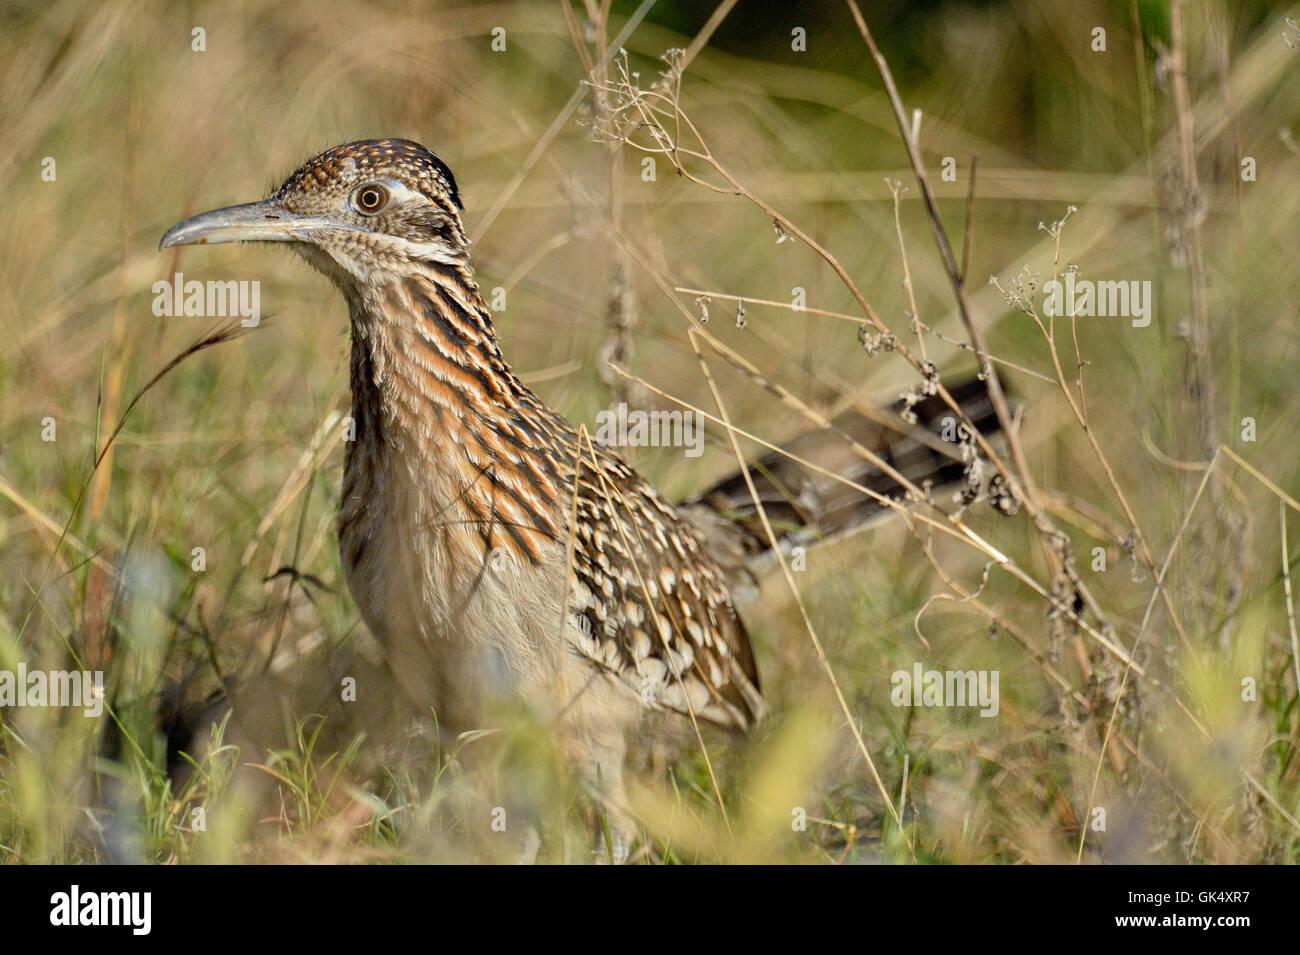 Greater roadrunner (Geococcyx californianus), Turkey Bend LCRA, Texas, USA - Stock Image